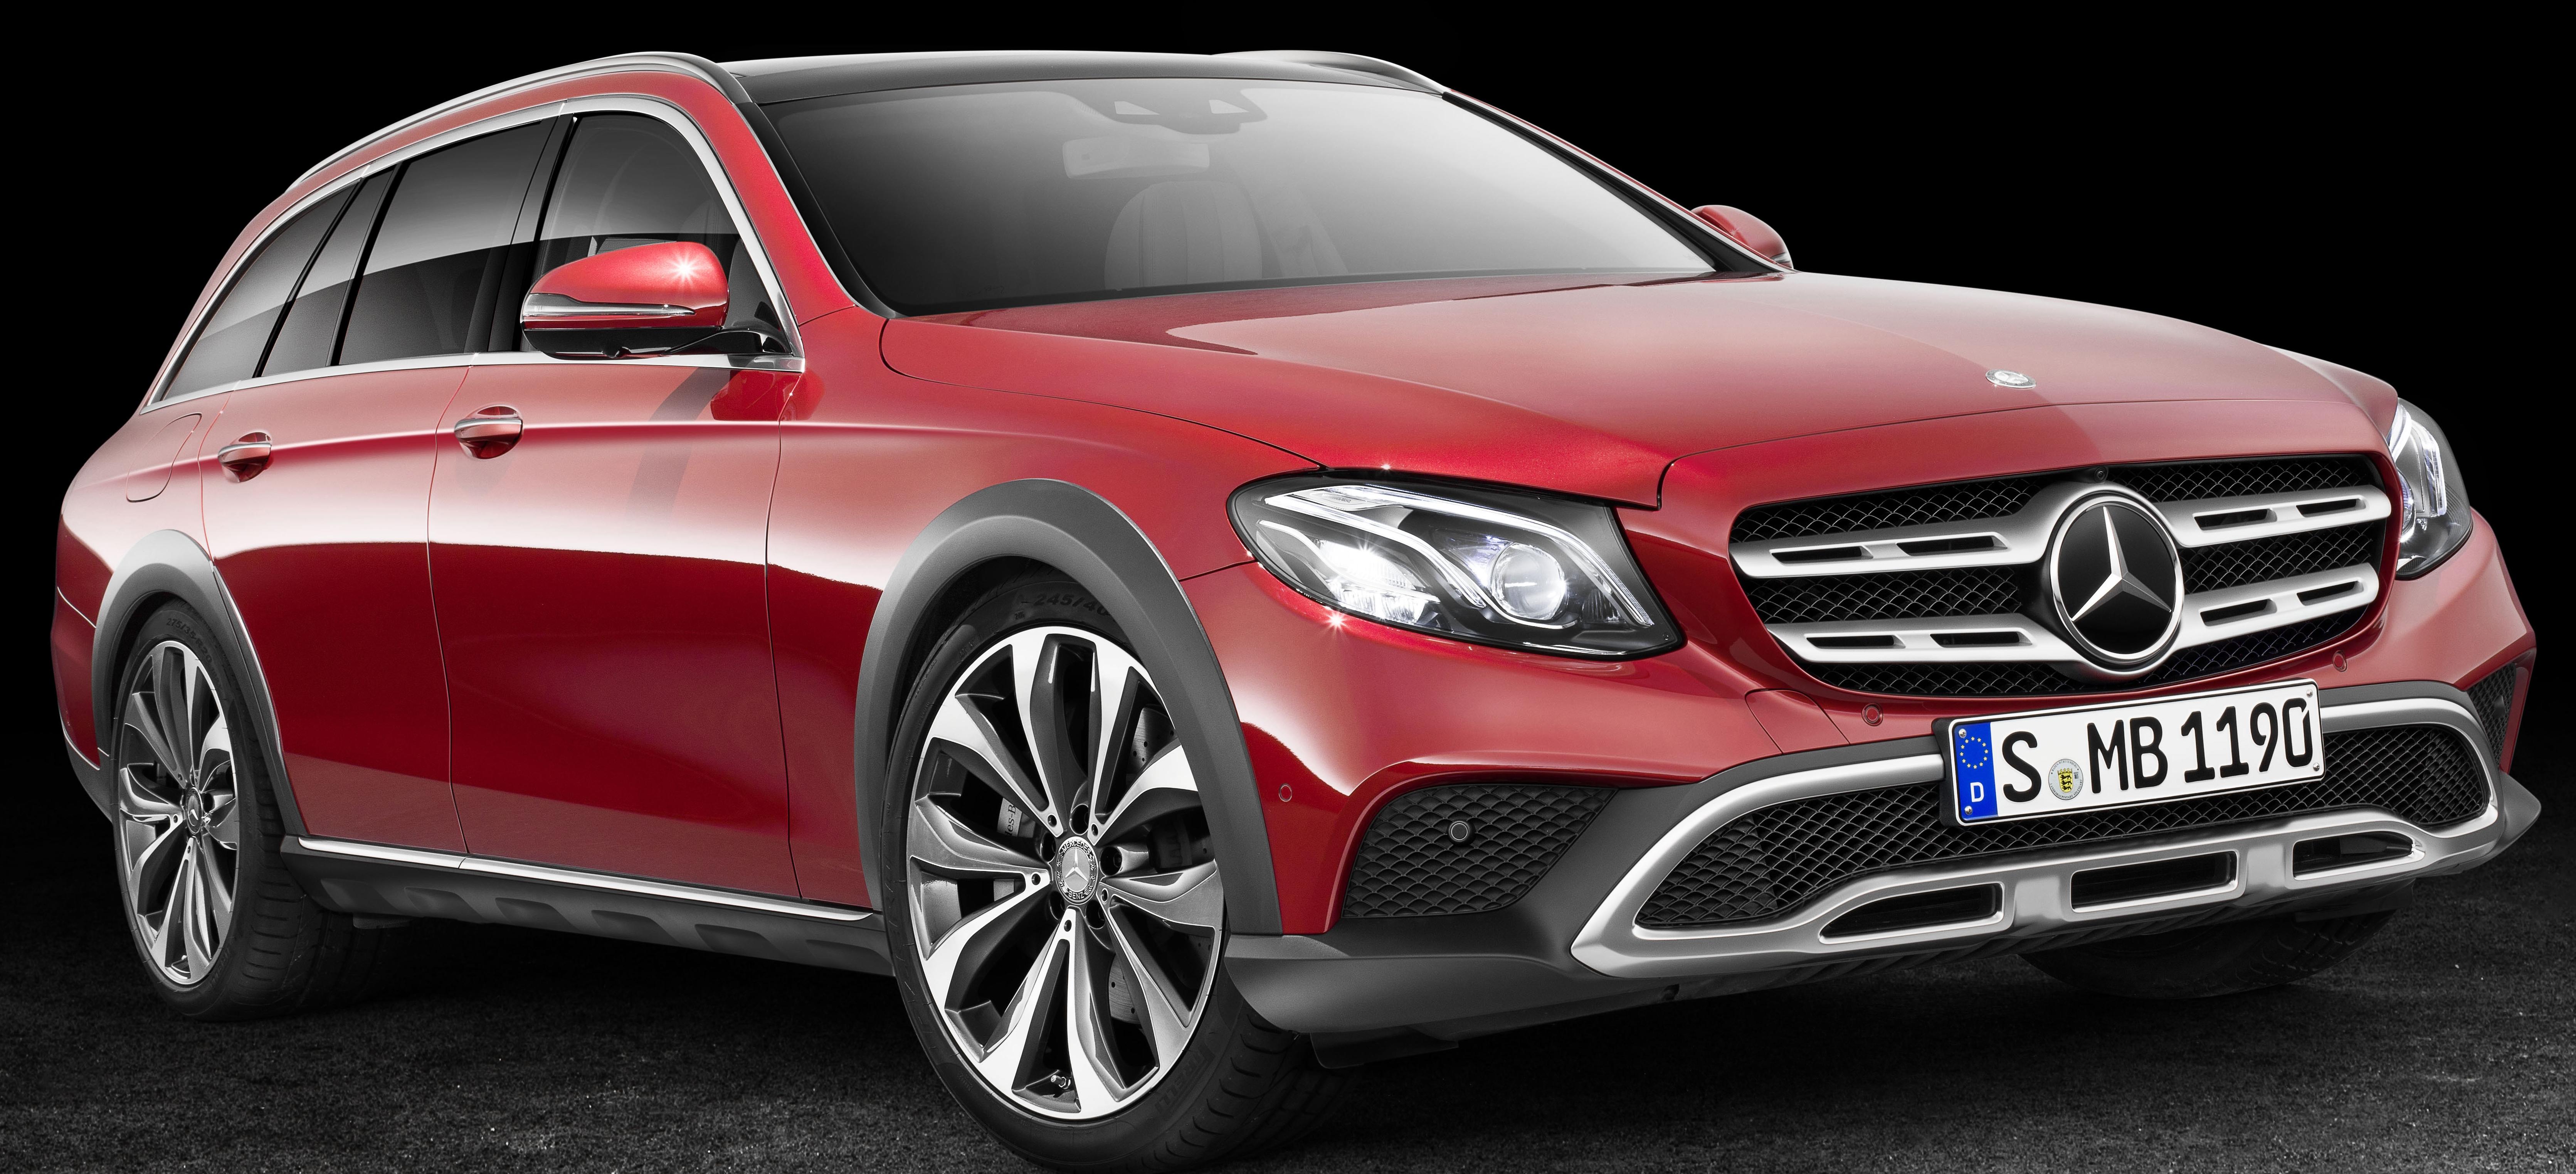 Mercedes benz e class x213 all terrain bakal saingi audi for What country is mercedes benz from